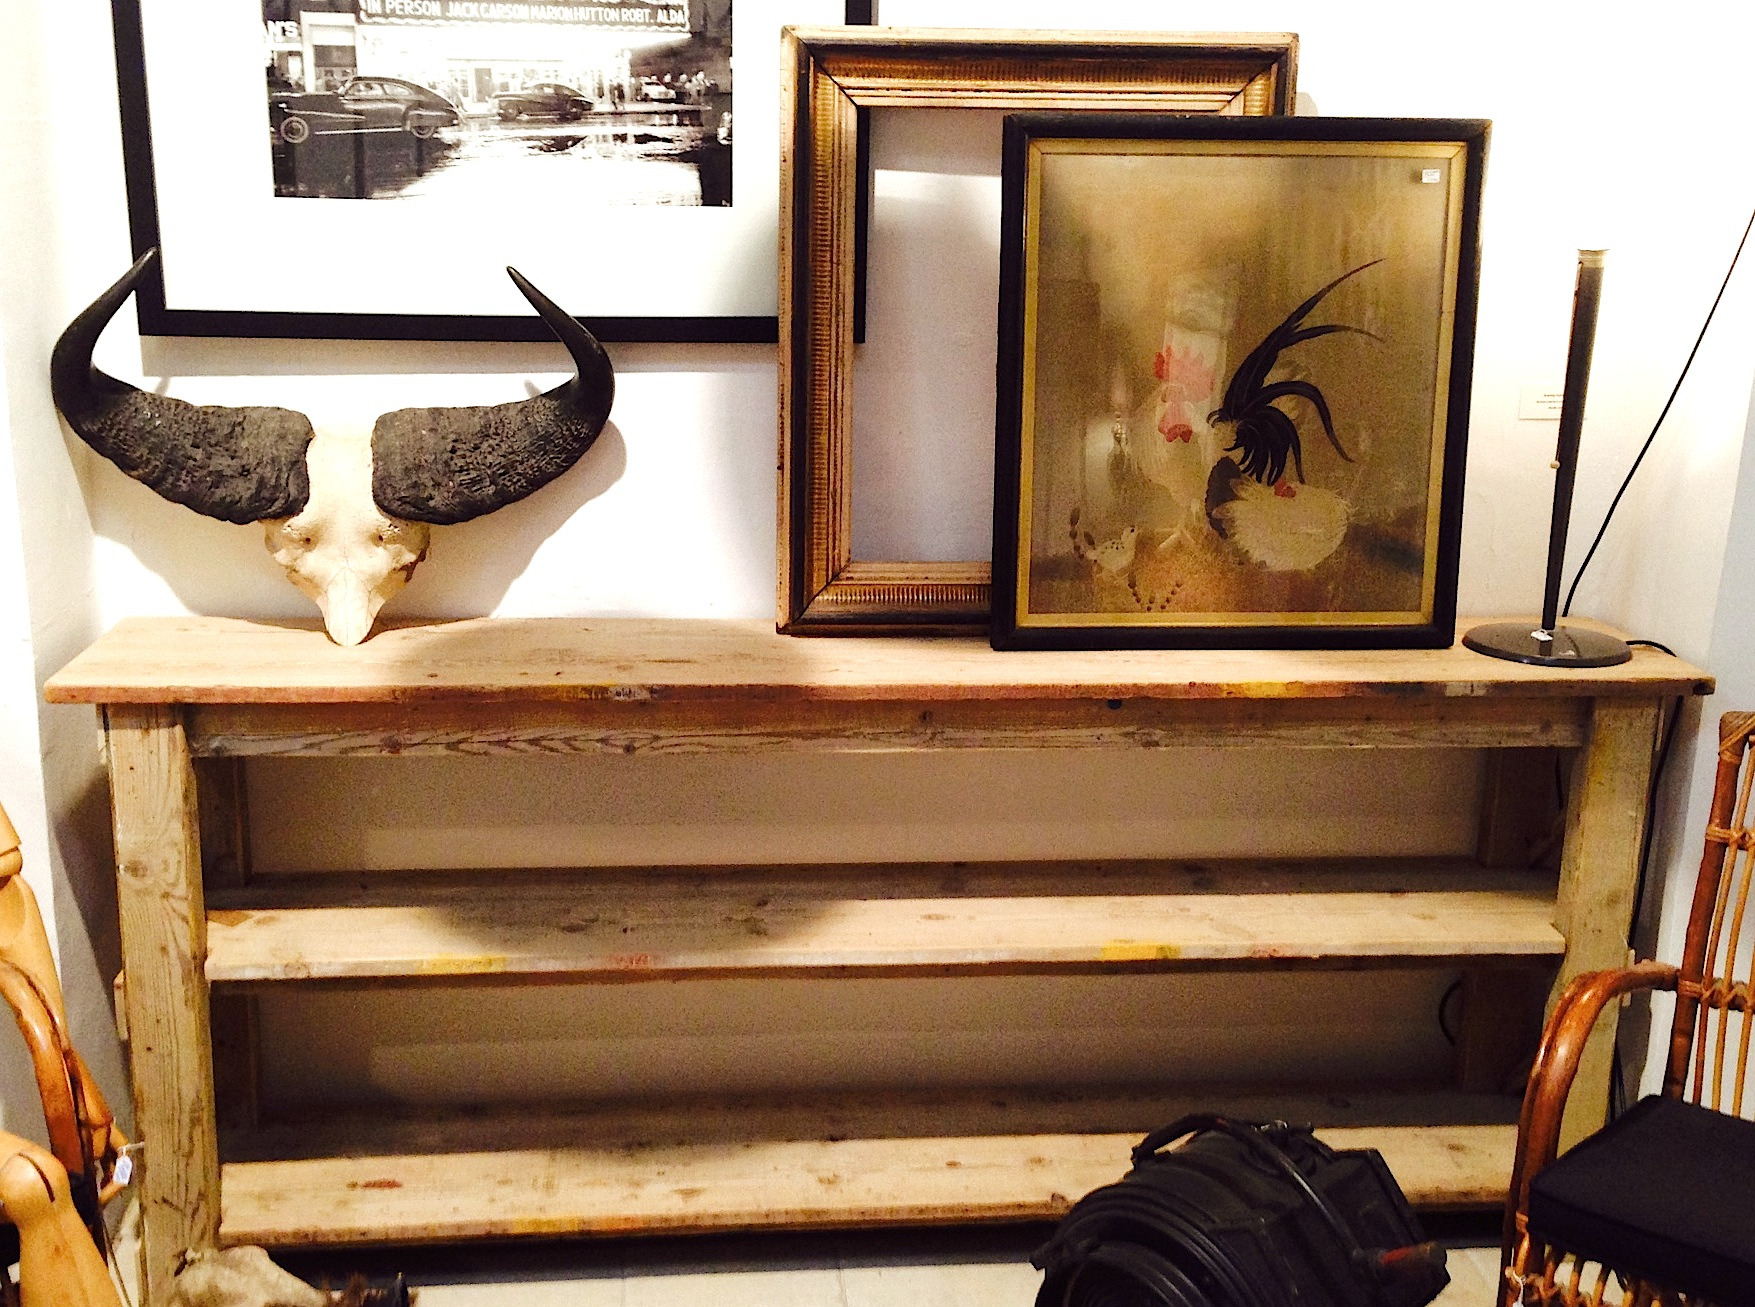 Mesa mostrador con estantes de madera antigua - Se hace a medida